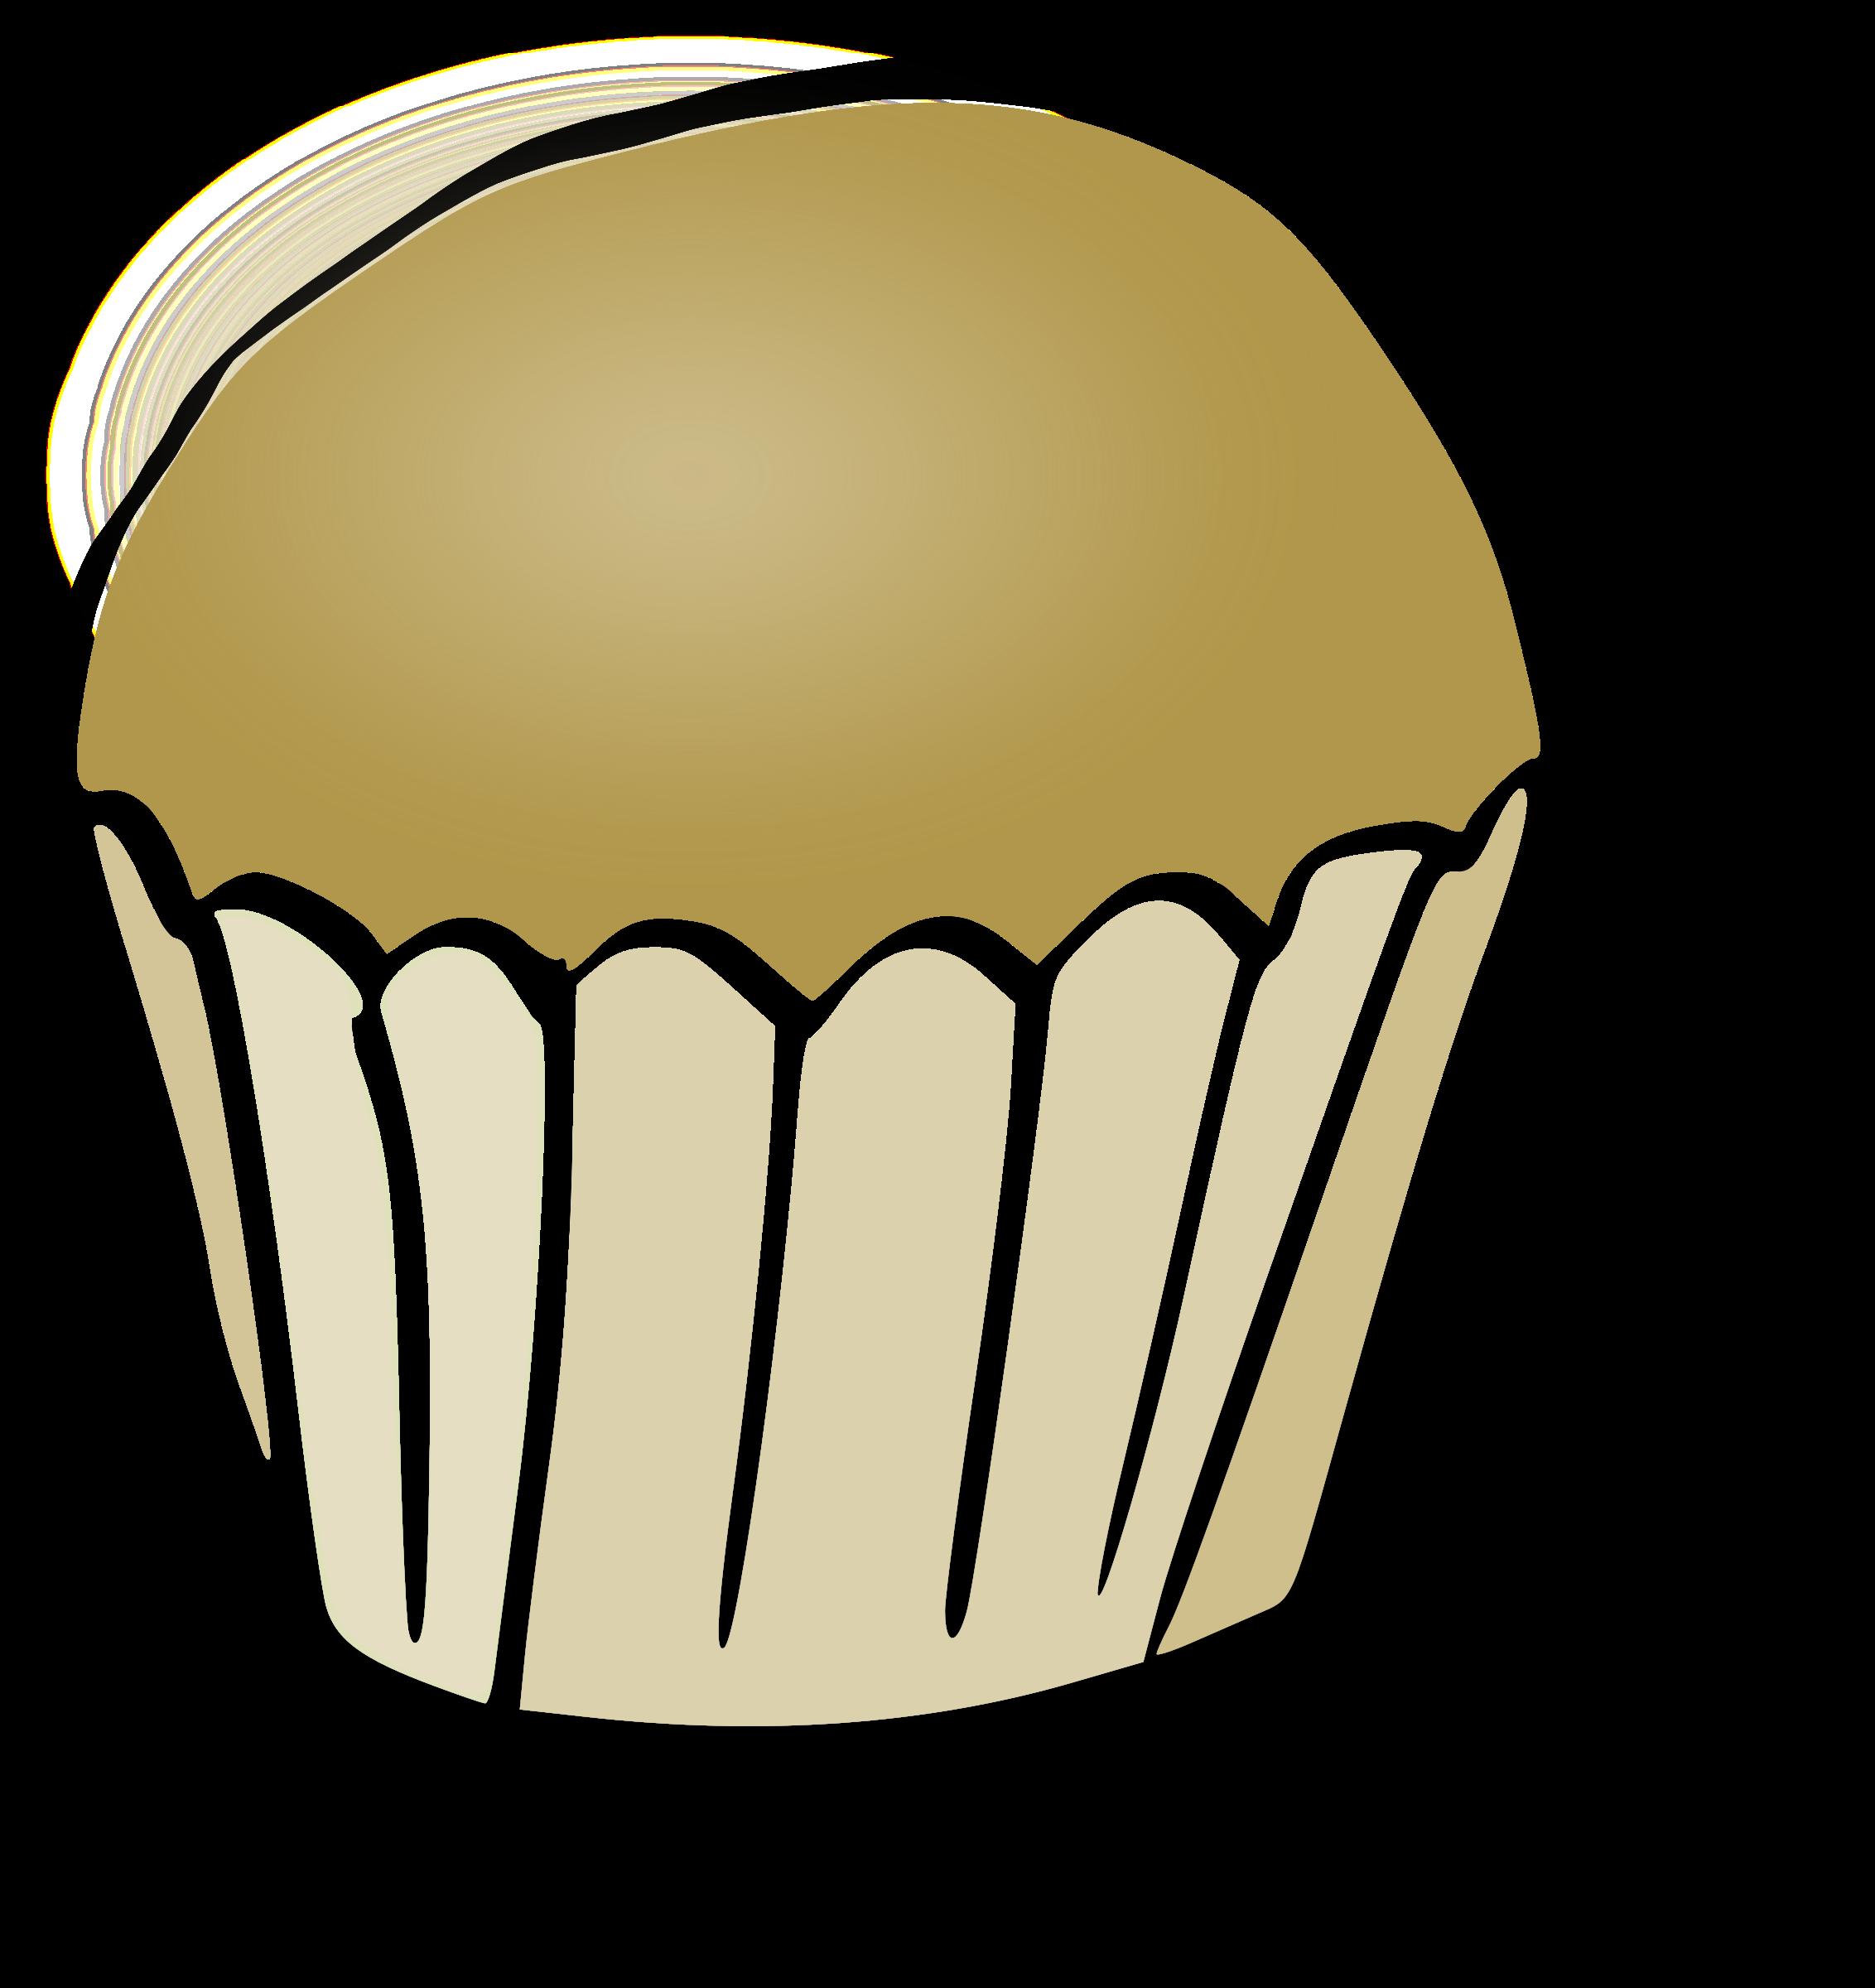 Blueberry Muffin clipart cupcake tray Clipart Clip art Muffin Muffin